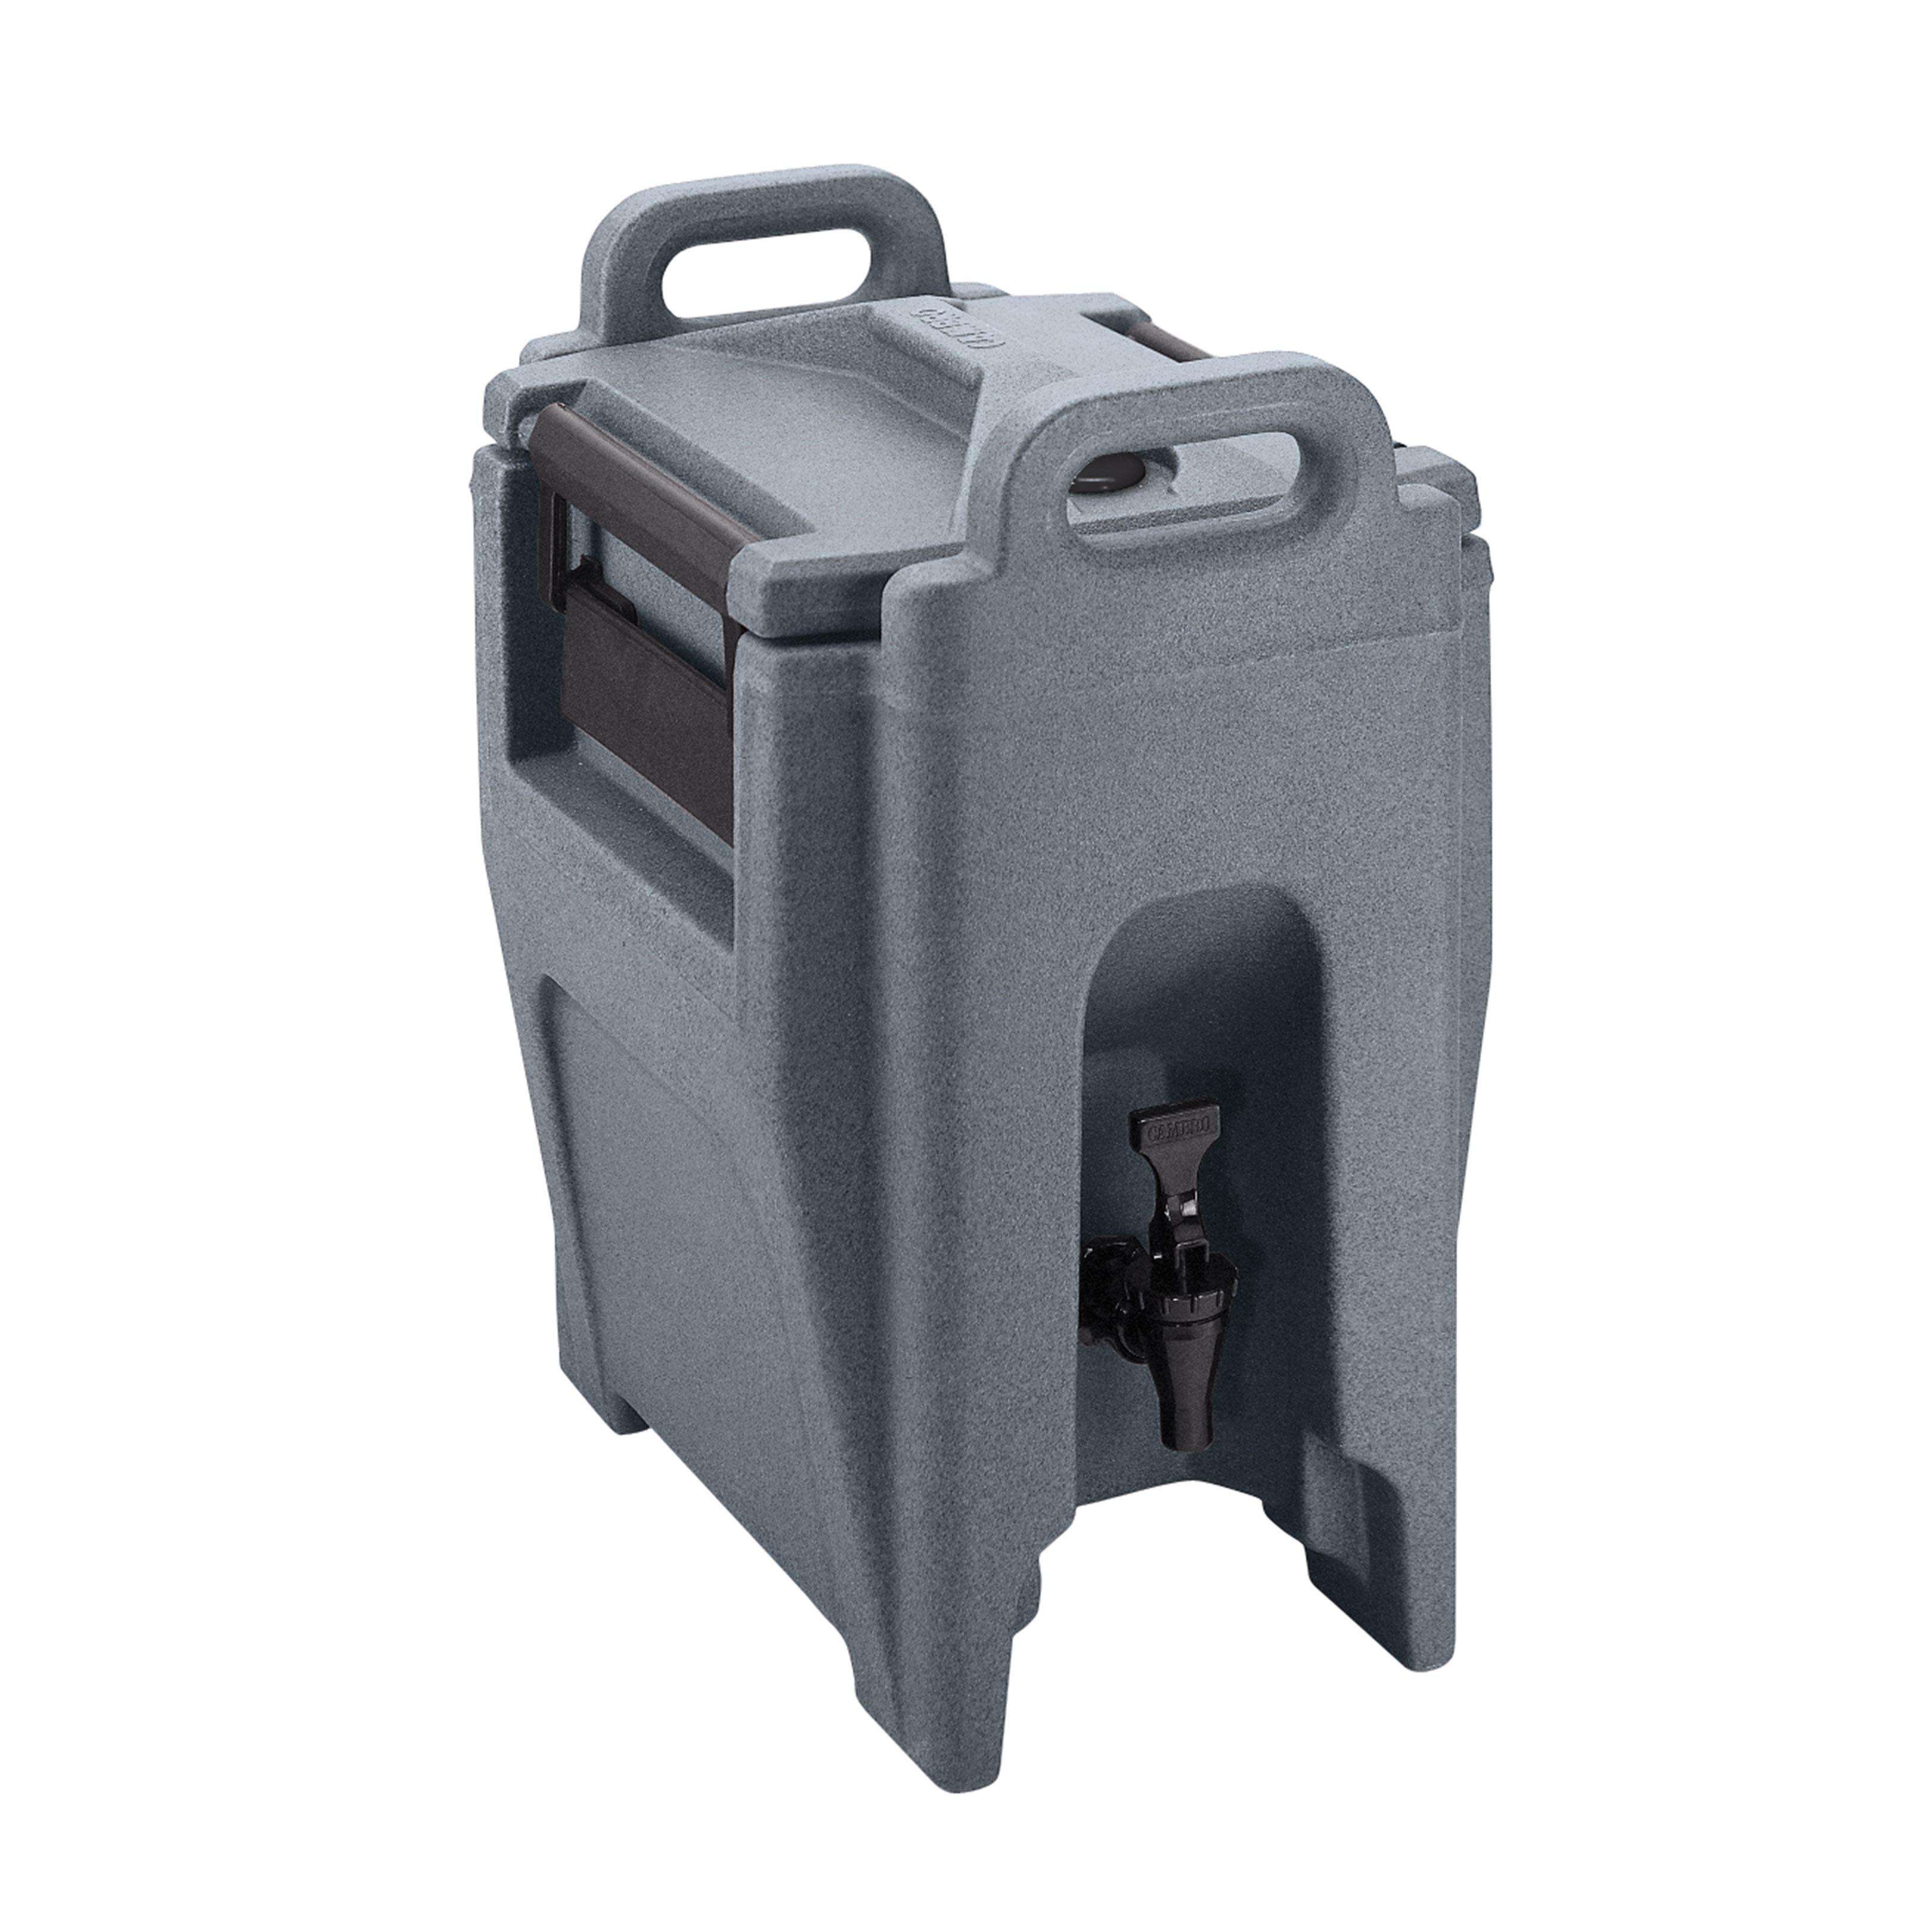 Cambro UC250191 beverage dispenser, insulated